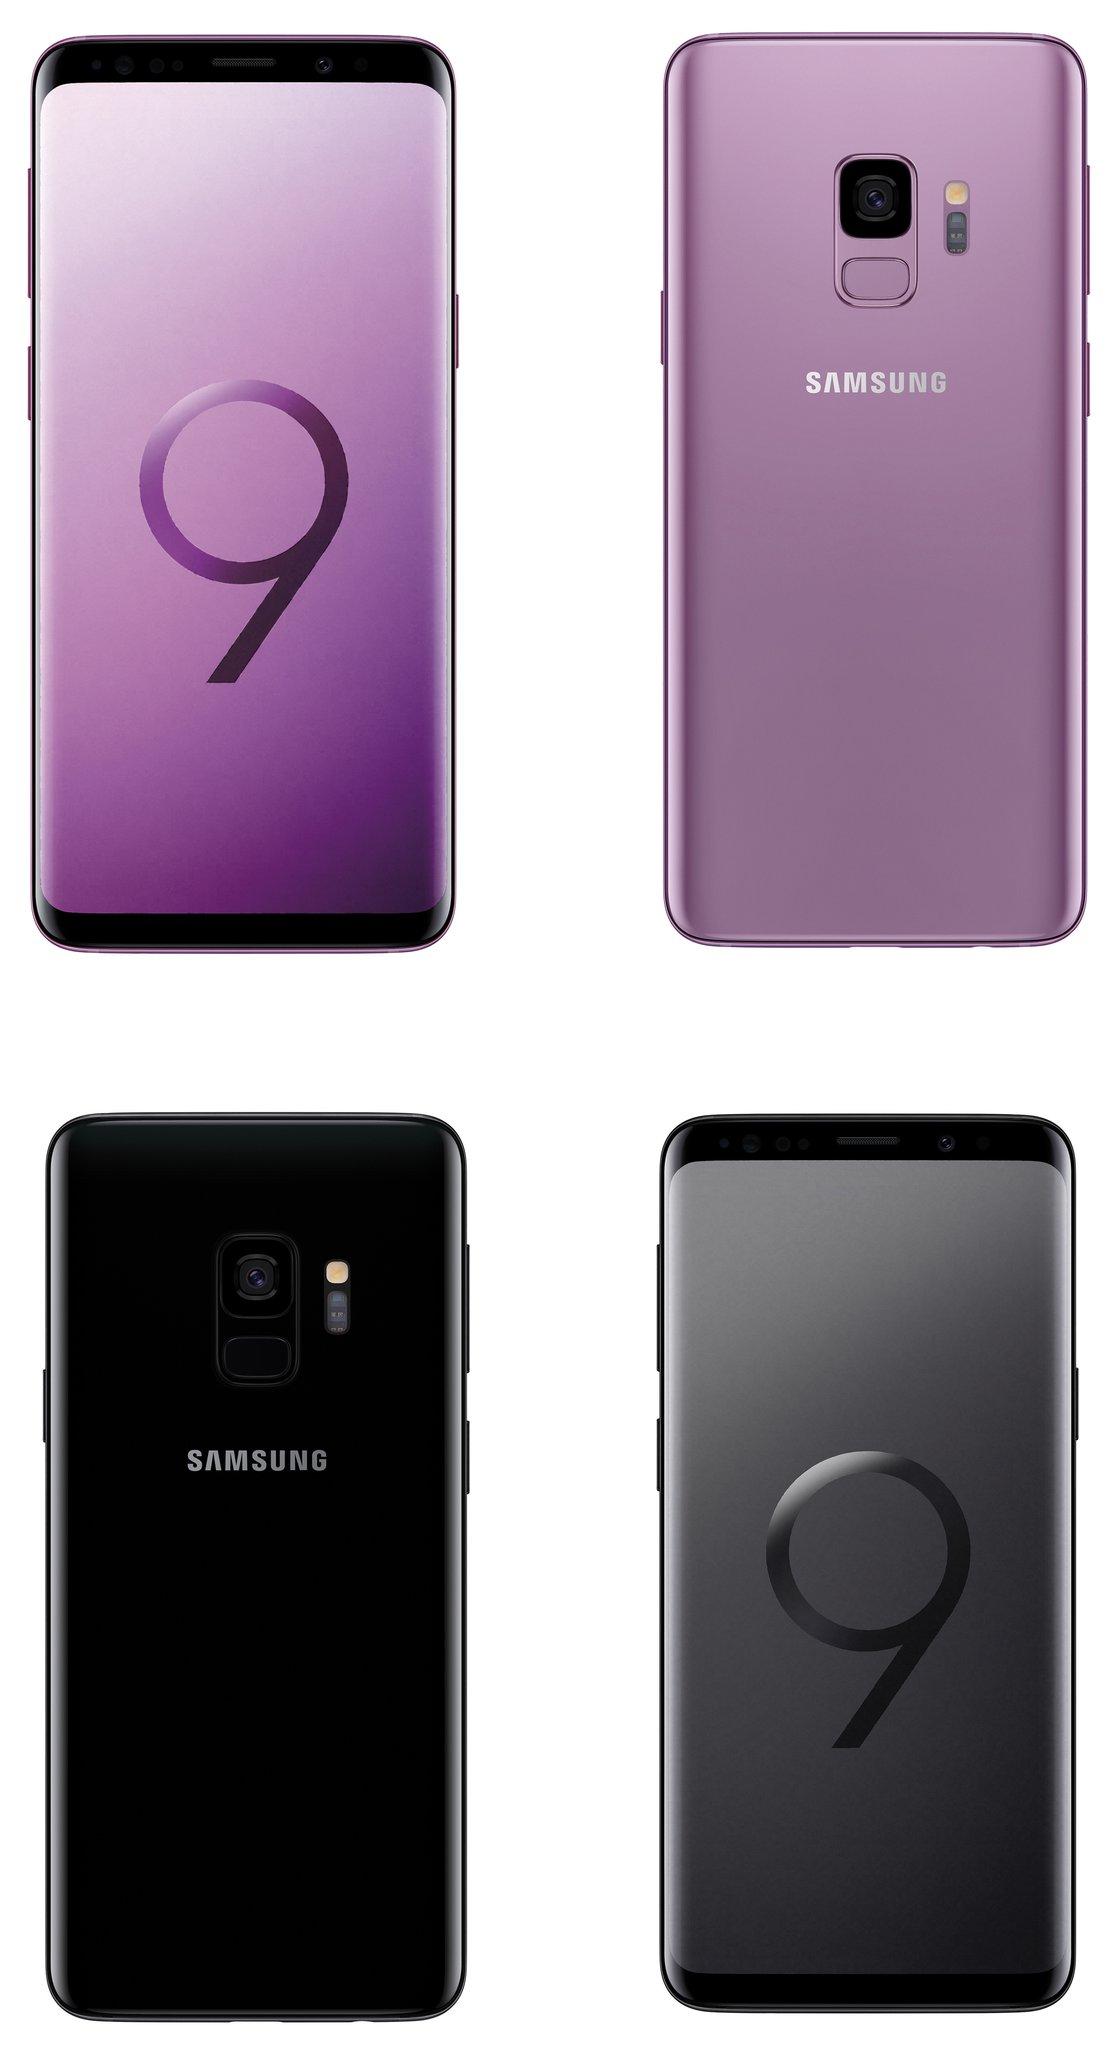 Samsung S9 Plus srebrni